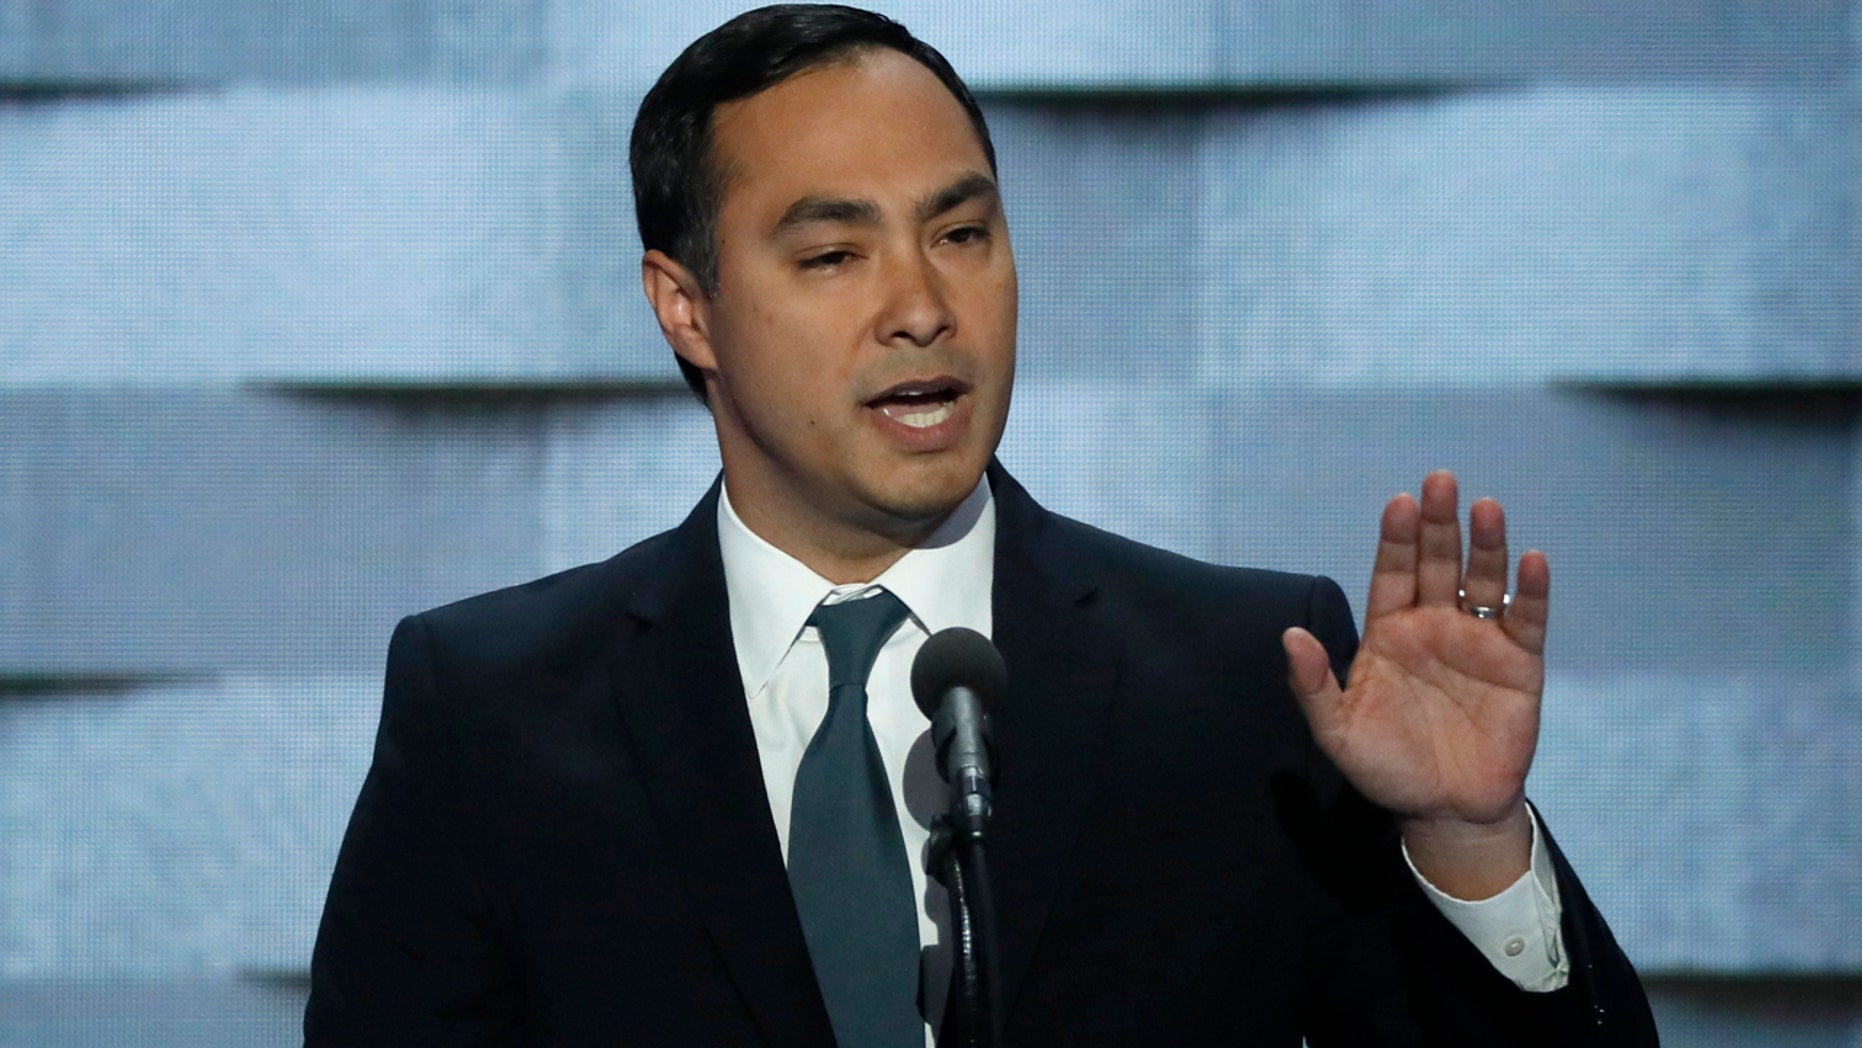 U.S. Representative Joaquin Castro (D-TX) speaks during the final night of the Democratic National Convention in Philadelphia, Pennsylvania, U.S. July 28, 2016